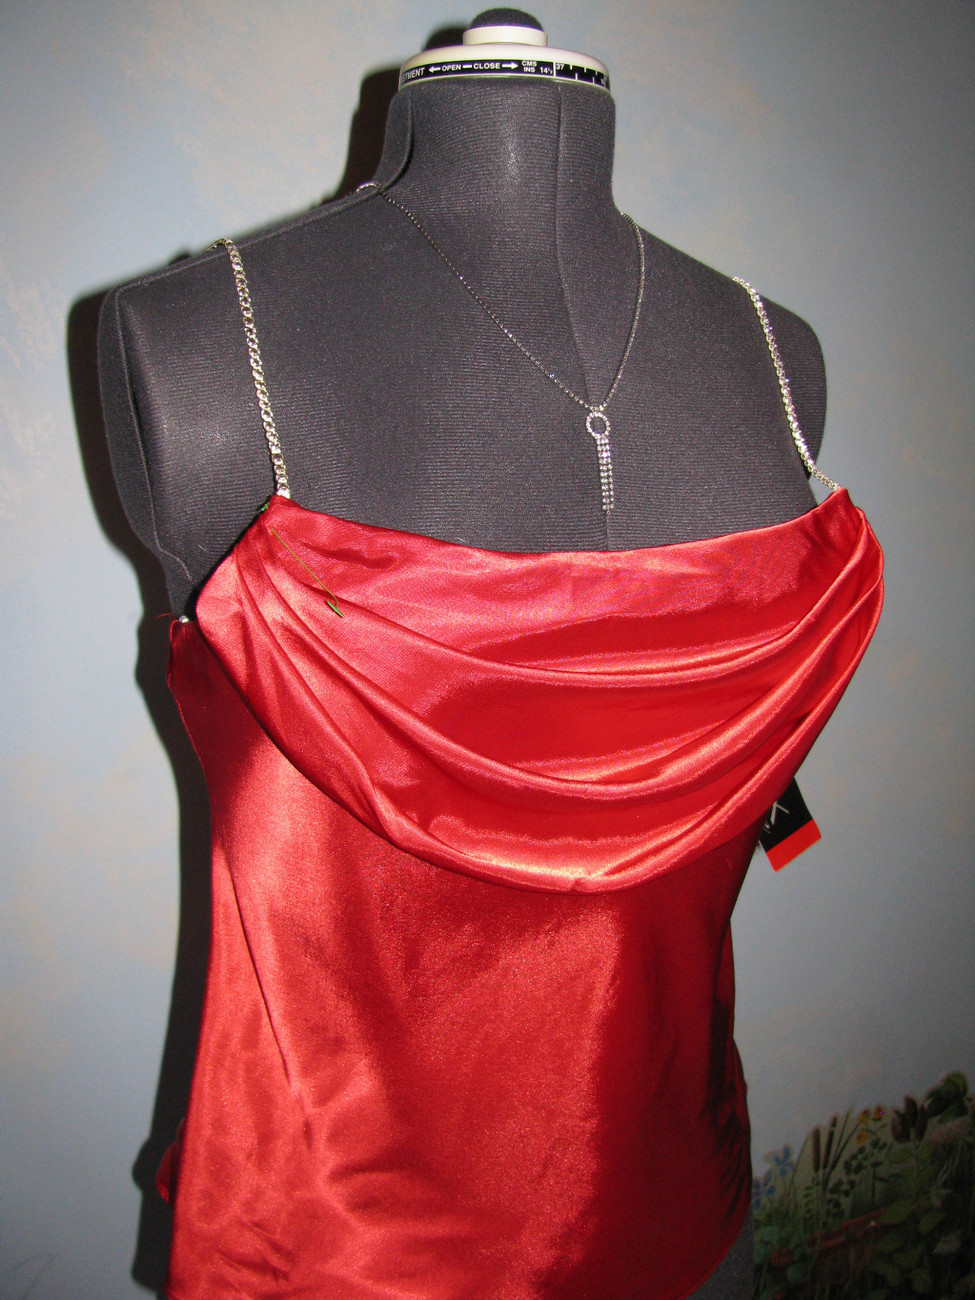 Onyx Nite Red Drape Satin Rhinestone Spaghetti Straps Top/blouse SZ L NWT